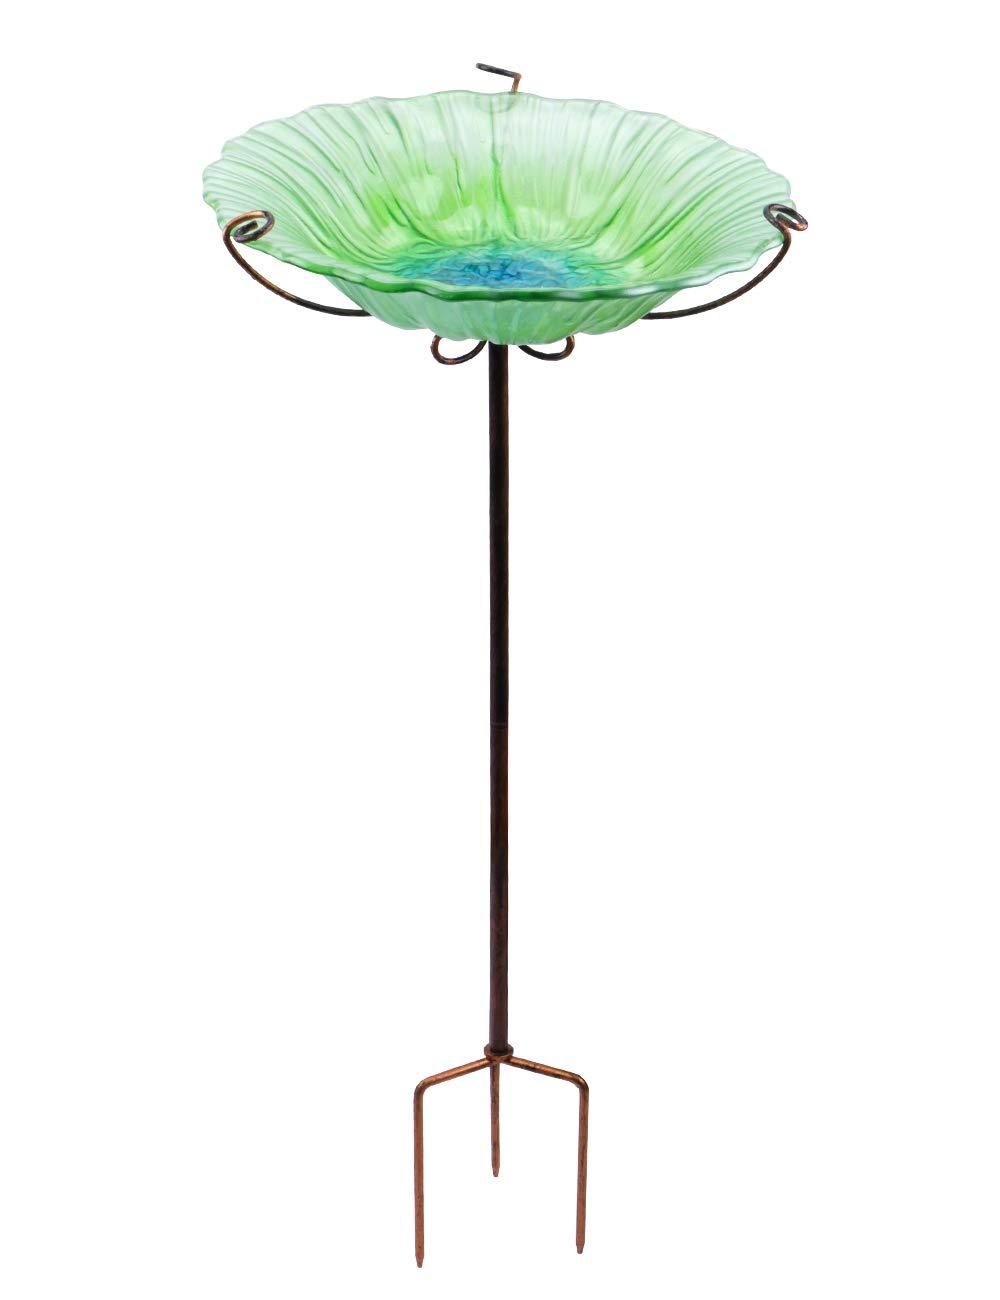 MUMTOP 26'' Glass Birdbath Birdfeeder with Metal Stake Garden Outdoor Green